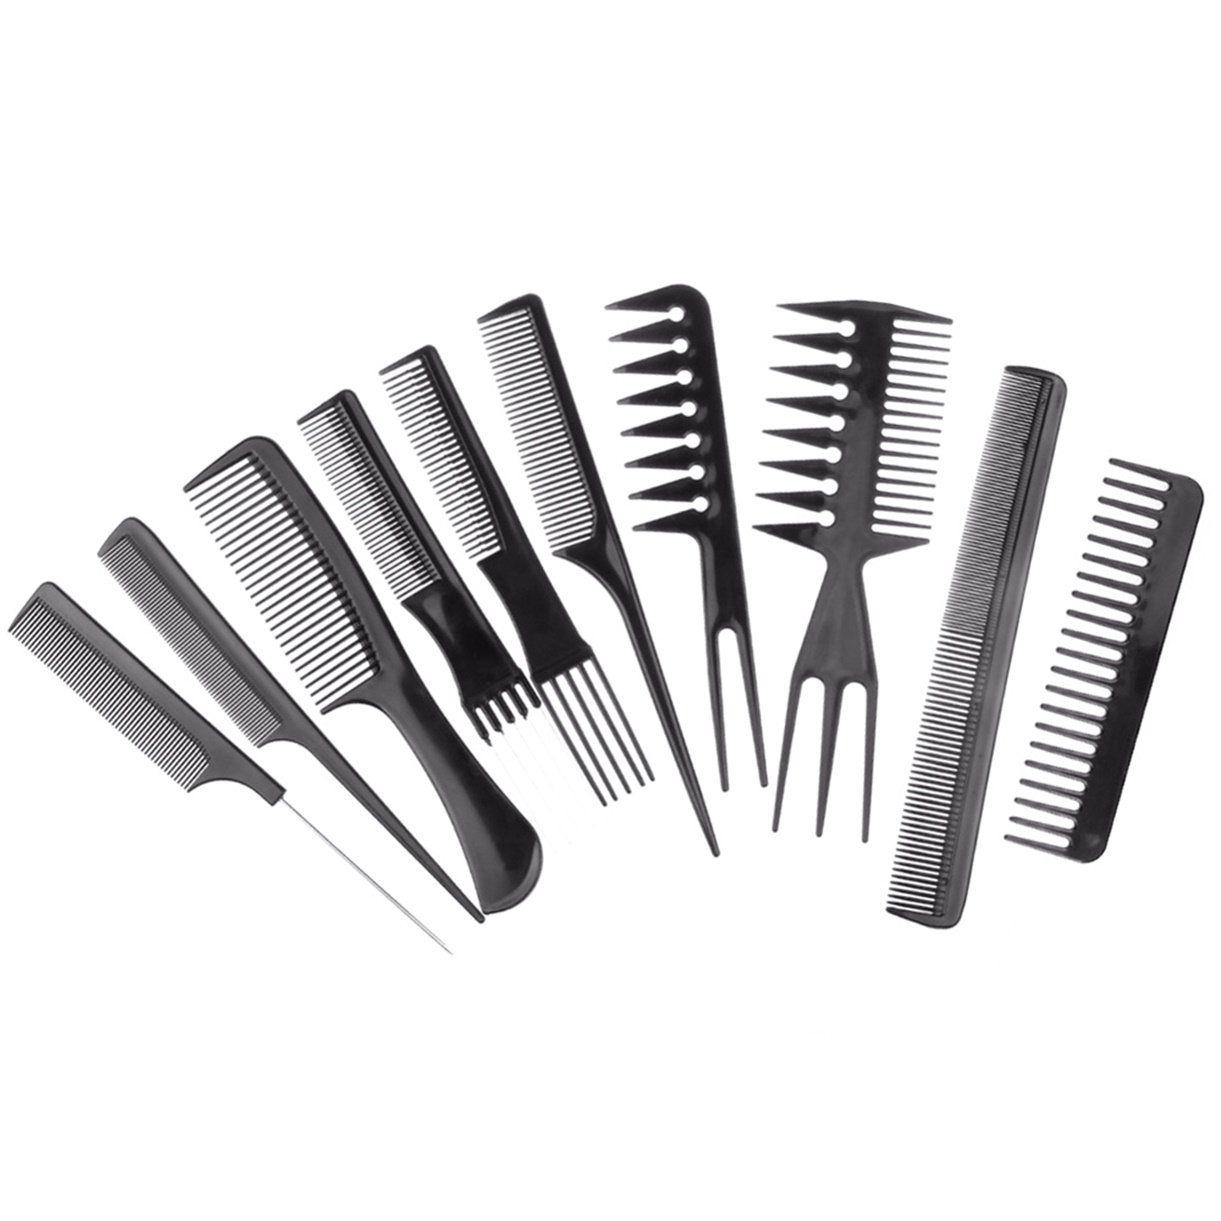 1 Set 10pcs Set Combs Hair Brush Professional Combs Salon Barber Brushes Anti Static Hairbrush Care Styling Professional Hairstyles Styling Tools Hair Tools